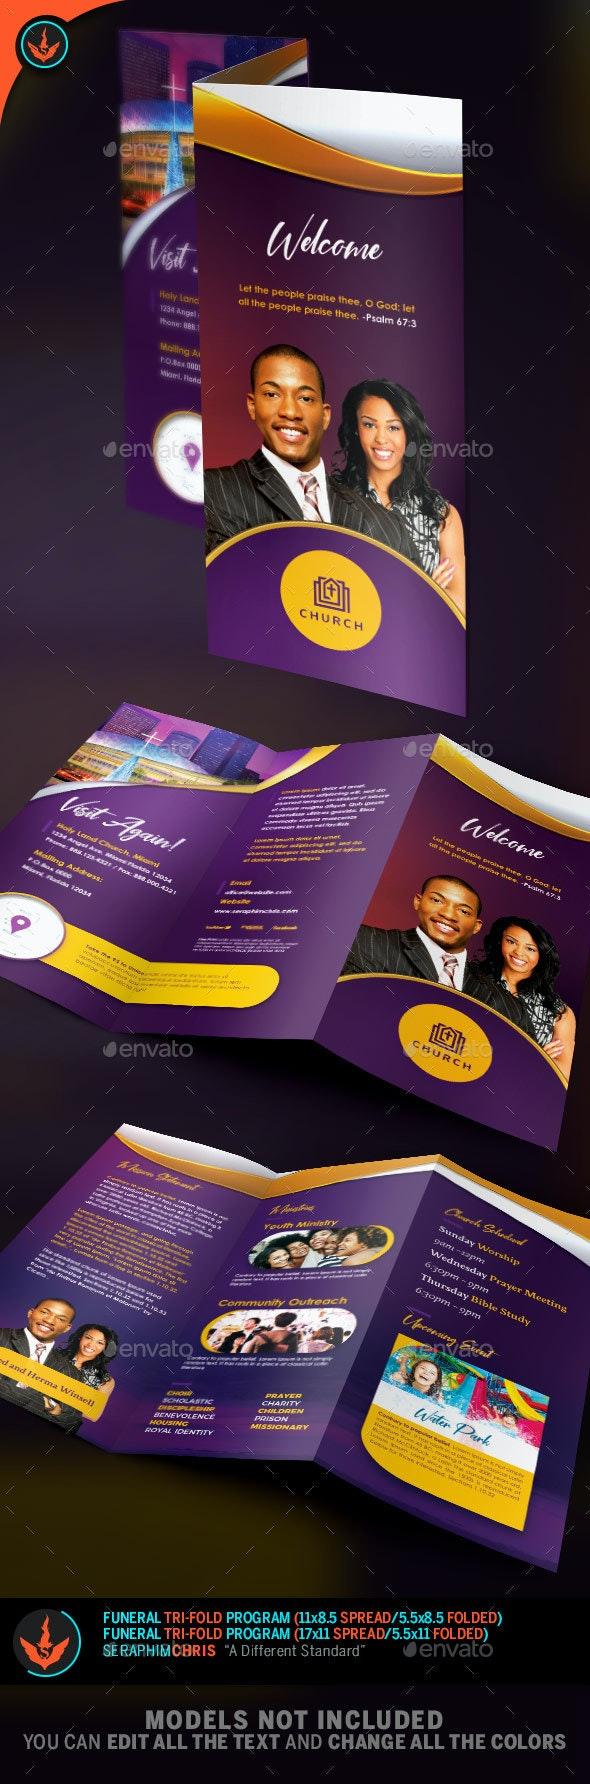 Church Tri-Fold Brochure Template 1 - Brochures Print Templates